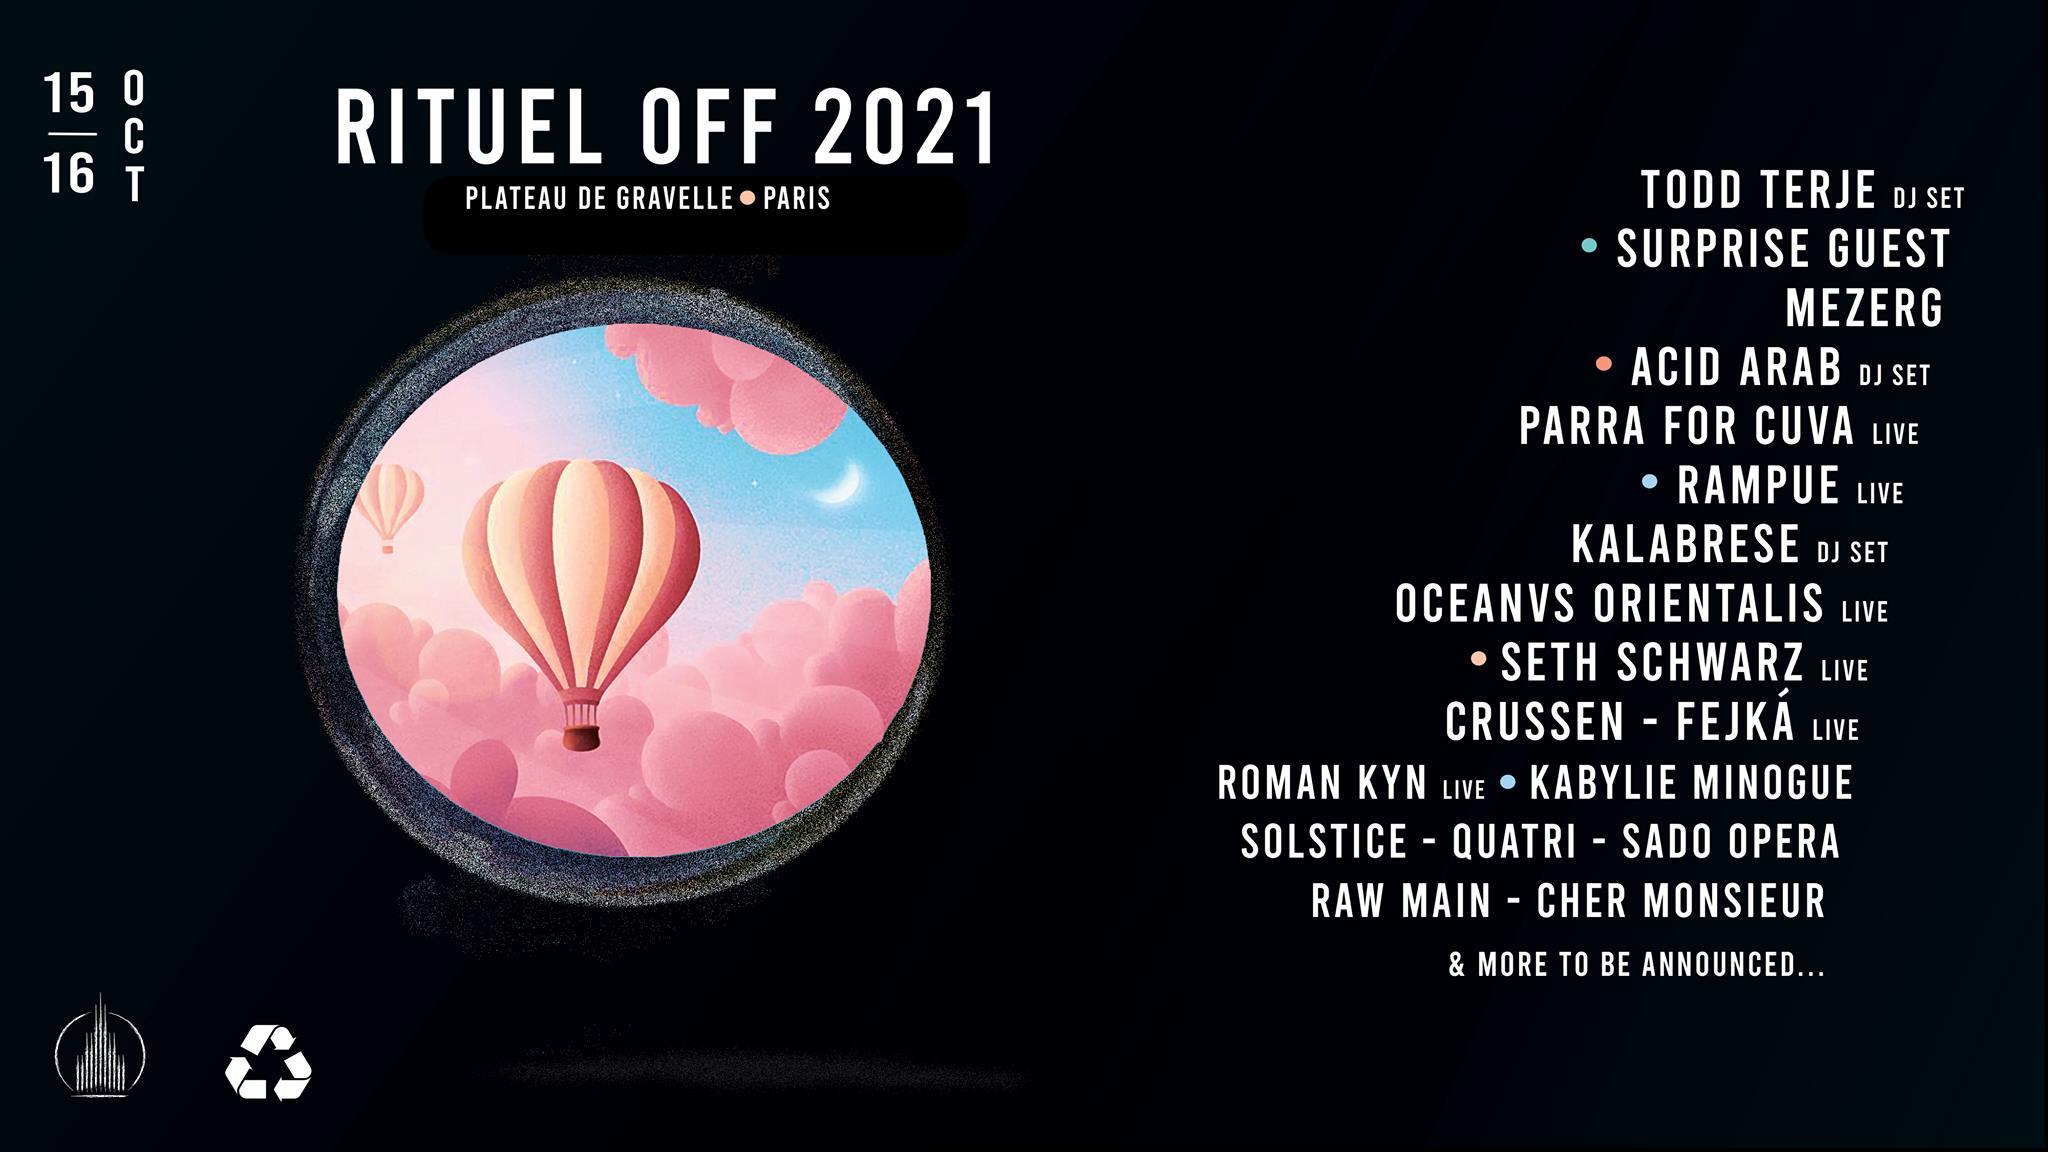 Rituel Off 2021